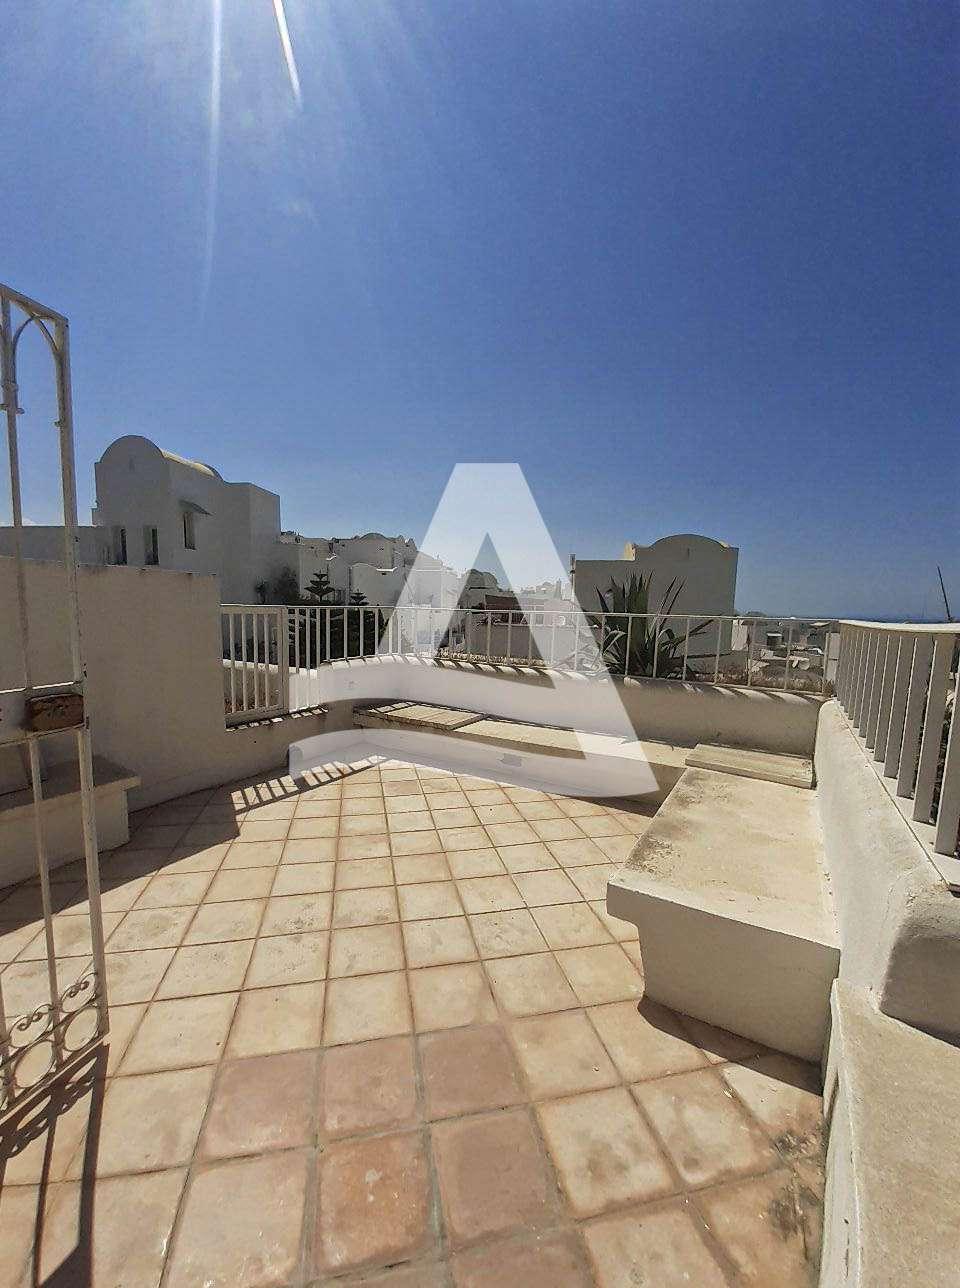 httpss3.amazonaws.comlogimoaws16105419541623491452Appartement_Marsa_Tunisie_-7-1